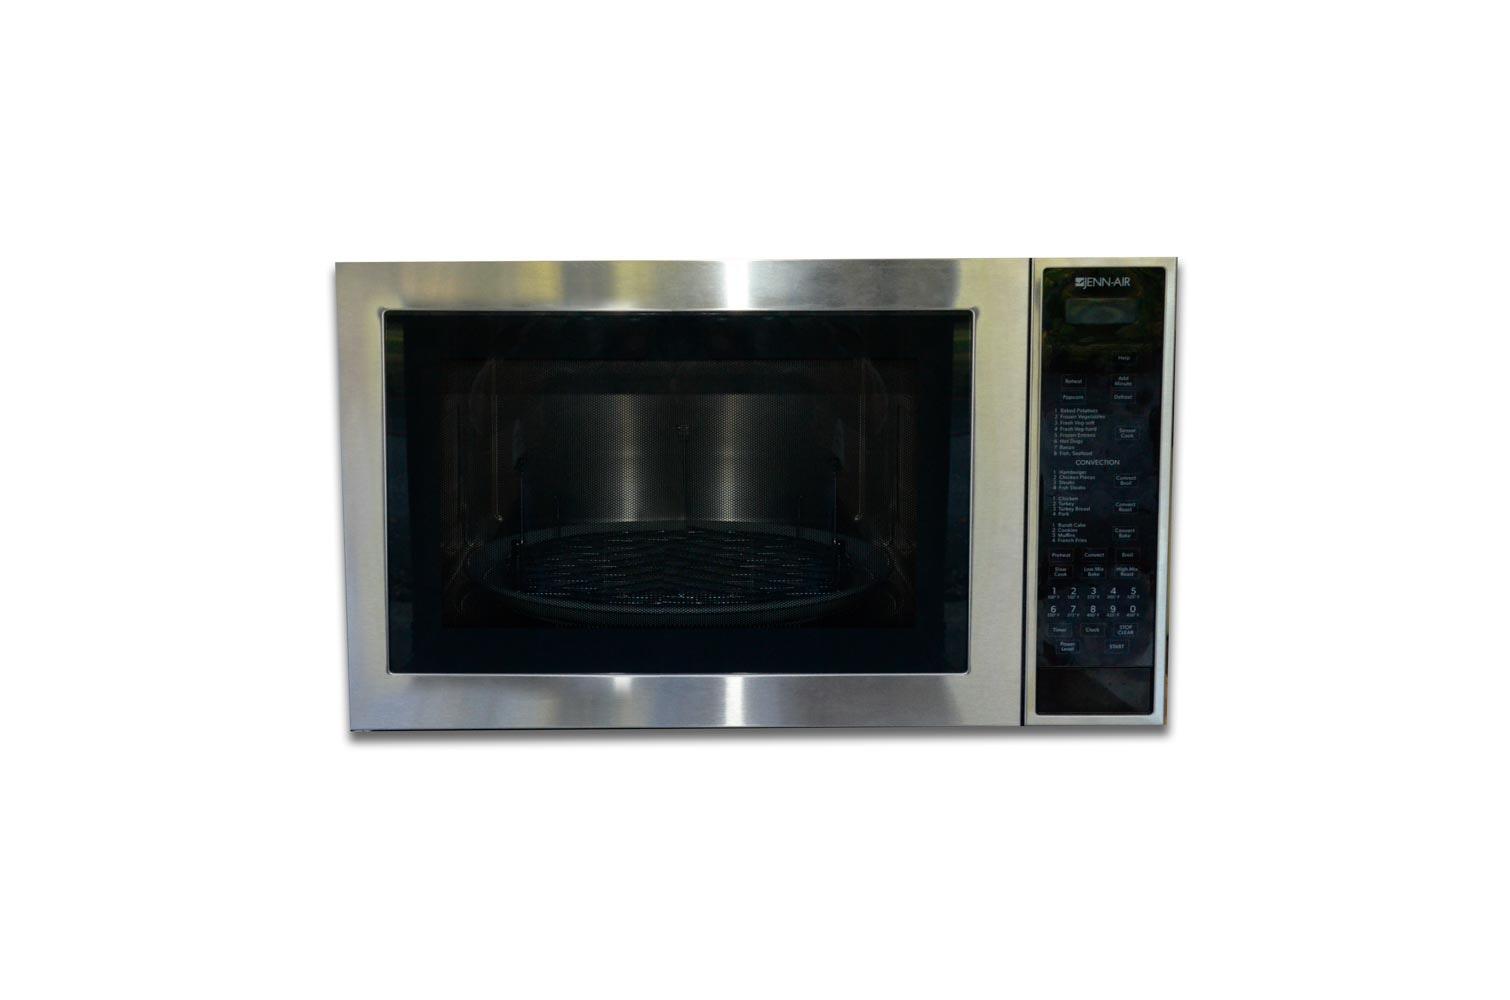 Jenn-Air Convection Microwave Oven